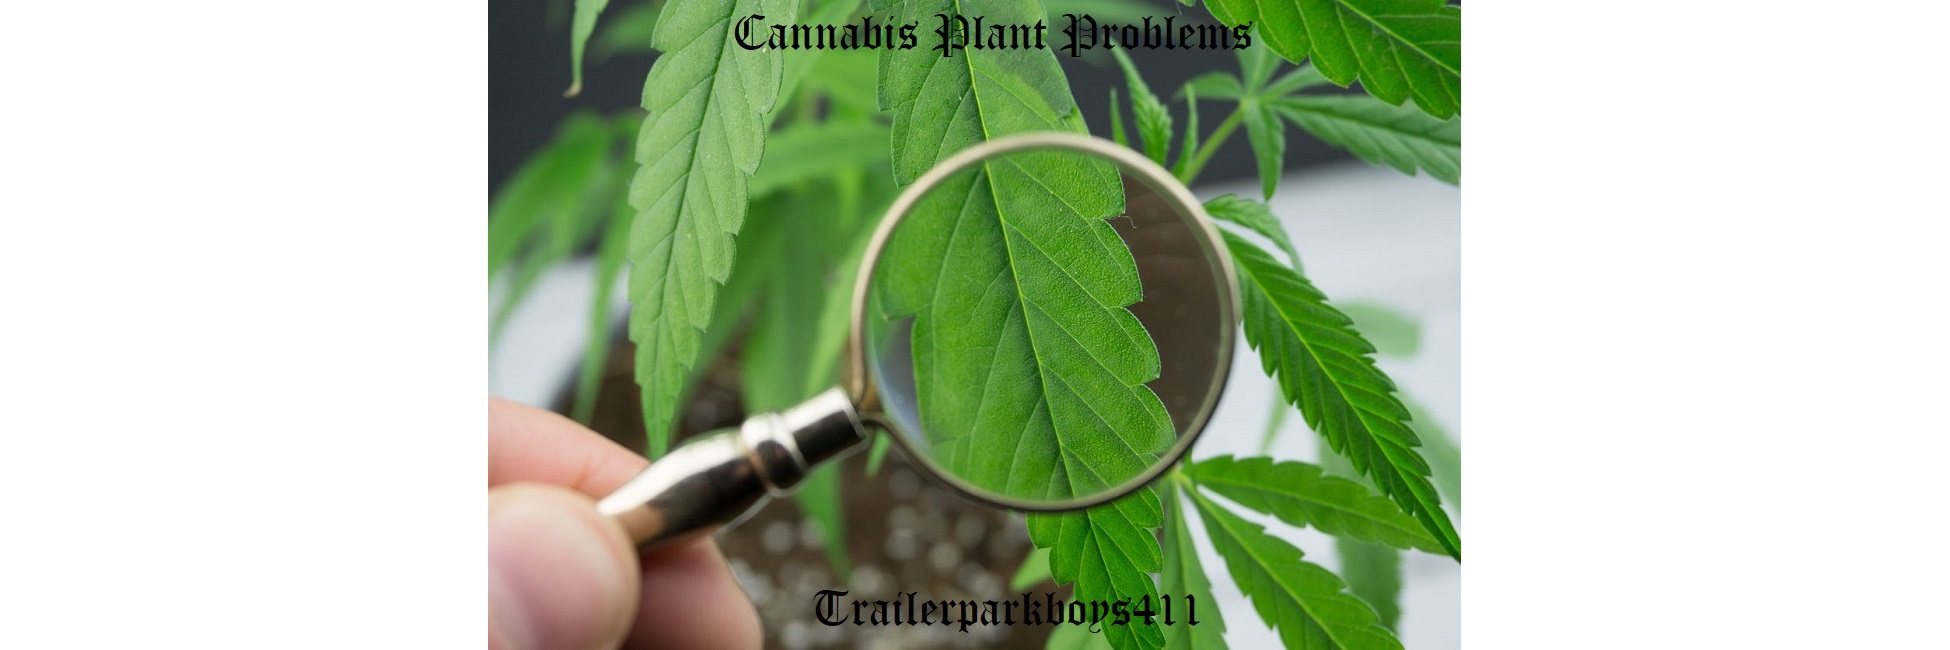 cannabis plant problems